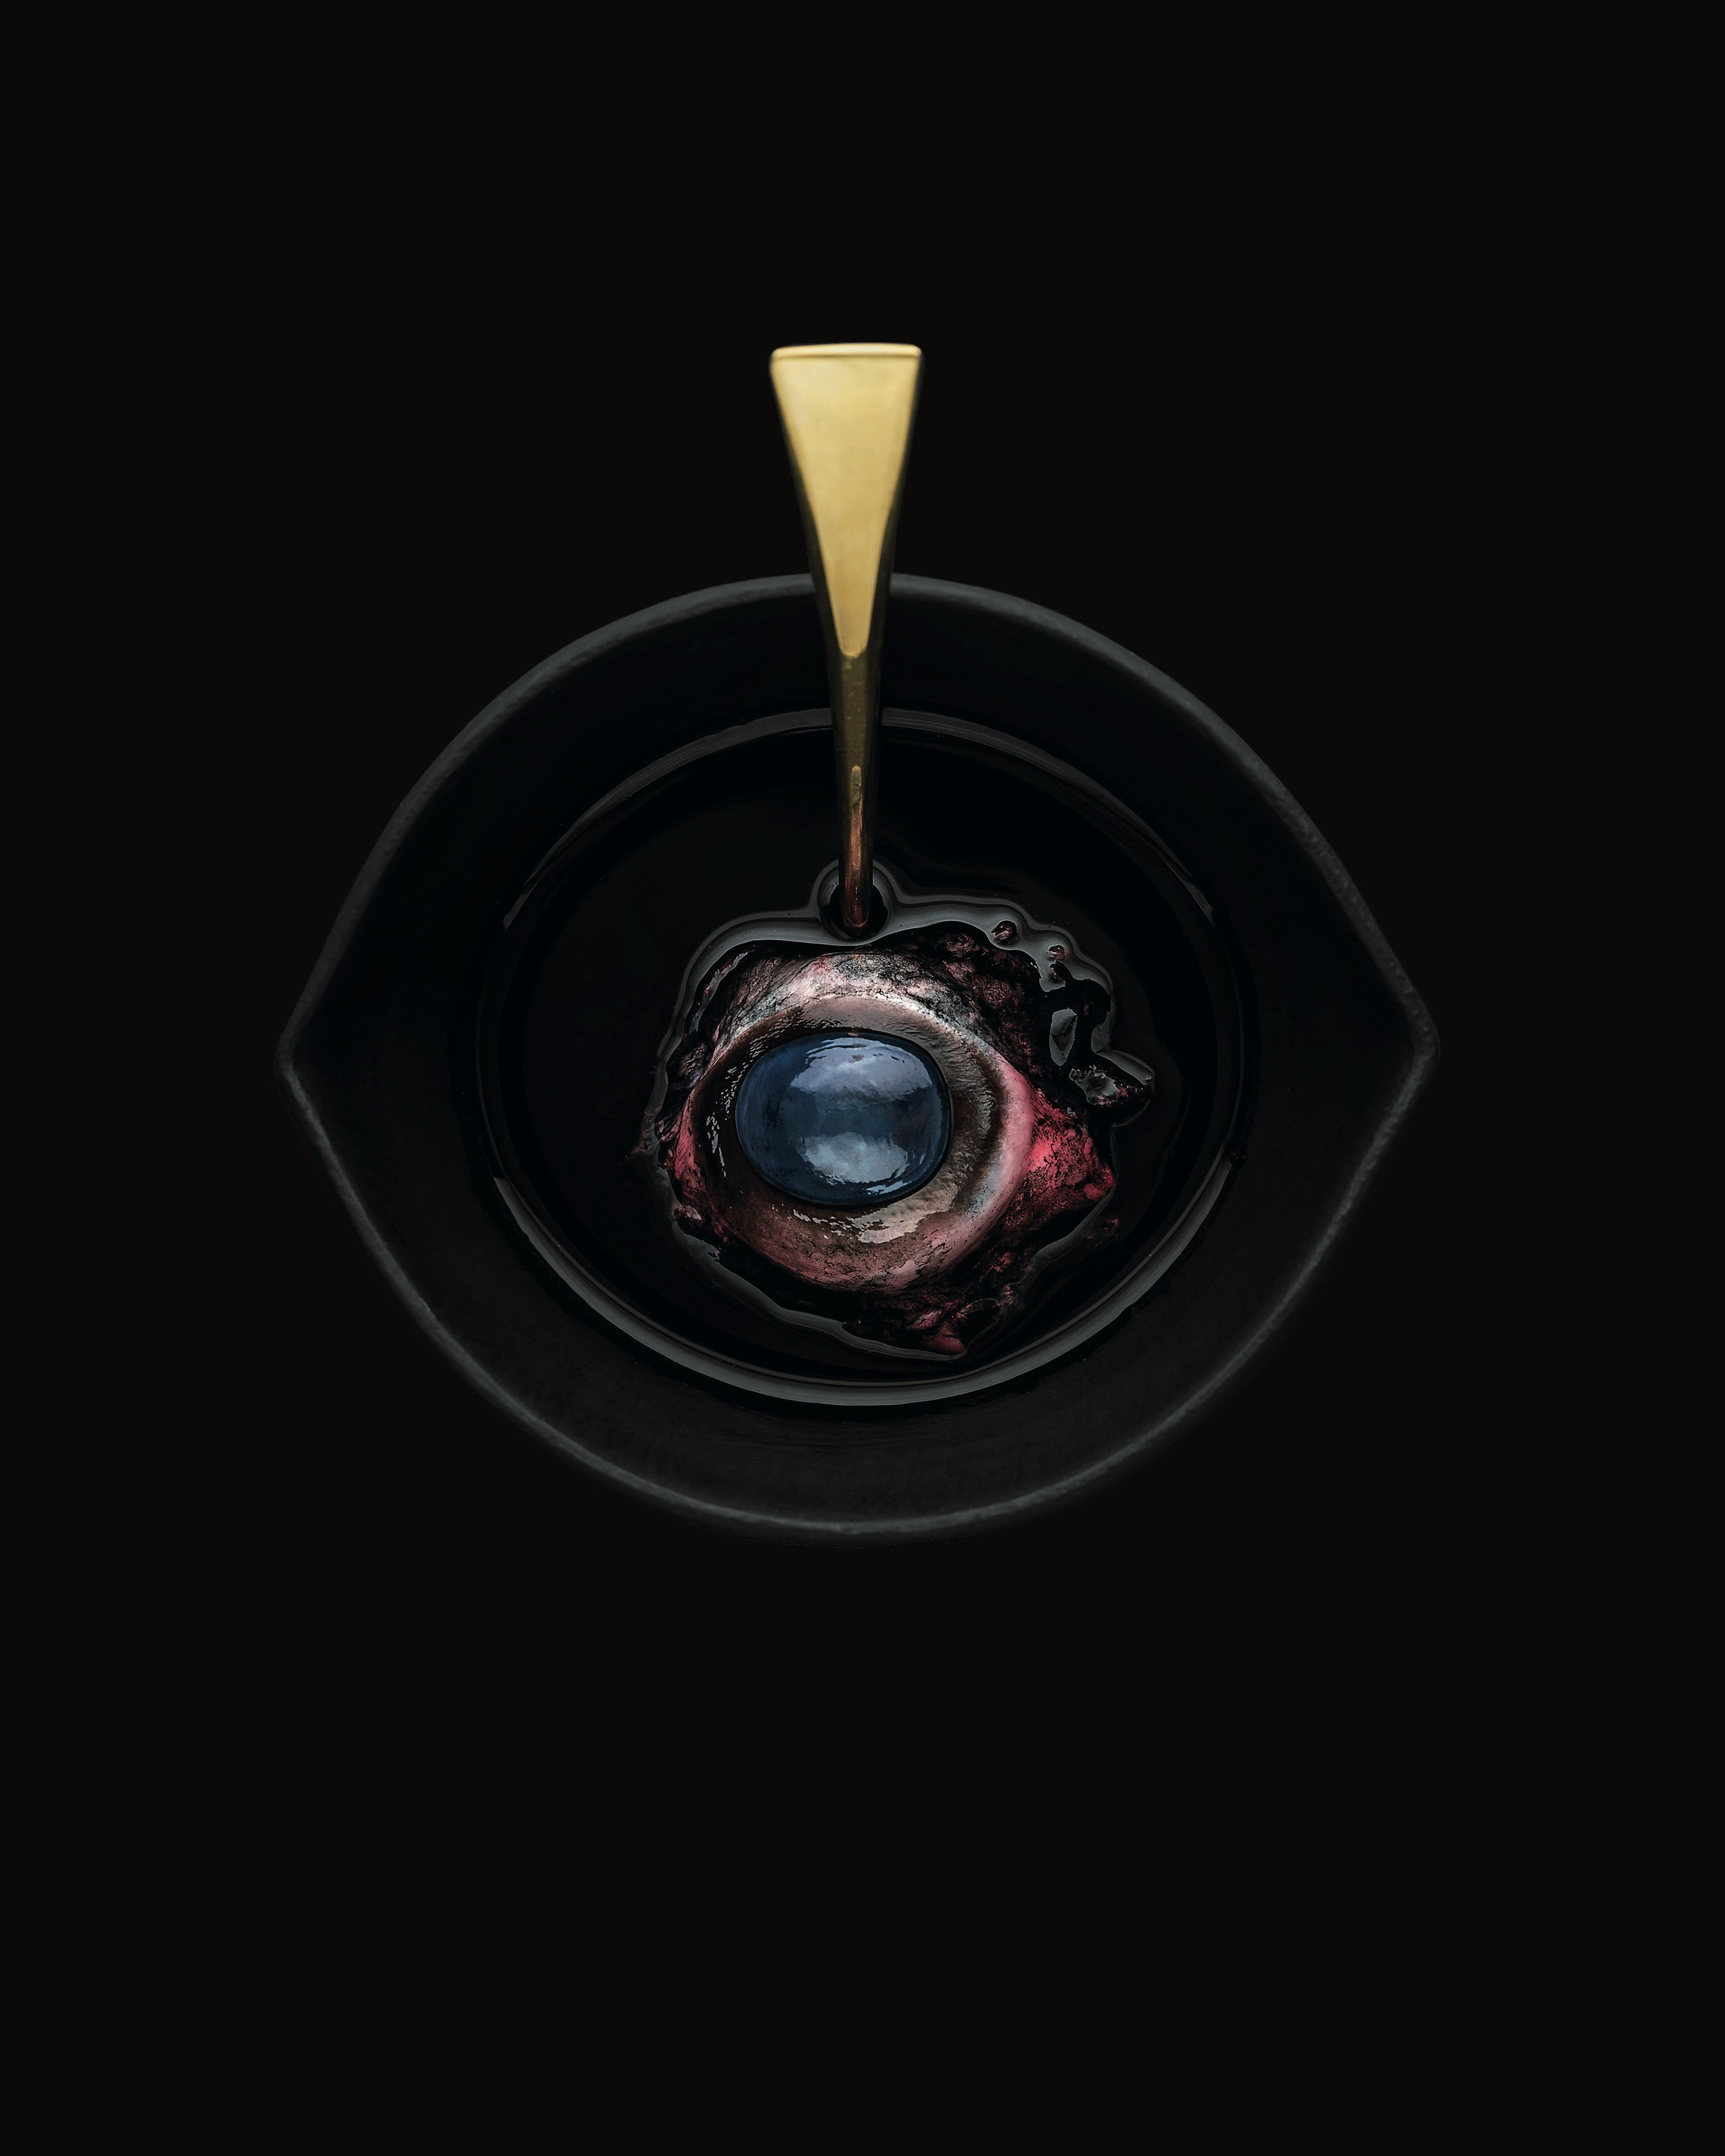 Wild Boar's eye Bloody Mary by Adam Turner from Eat the Problem by Kirsha Kaechele (Mona, $277.77, mona.net.au). Photo credit Mitch Osborne(1).jpg